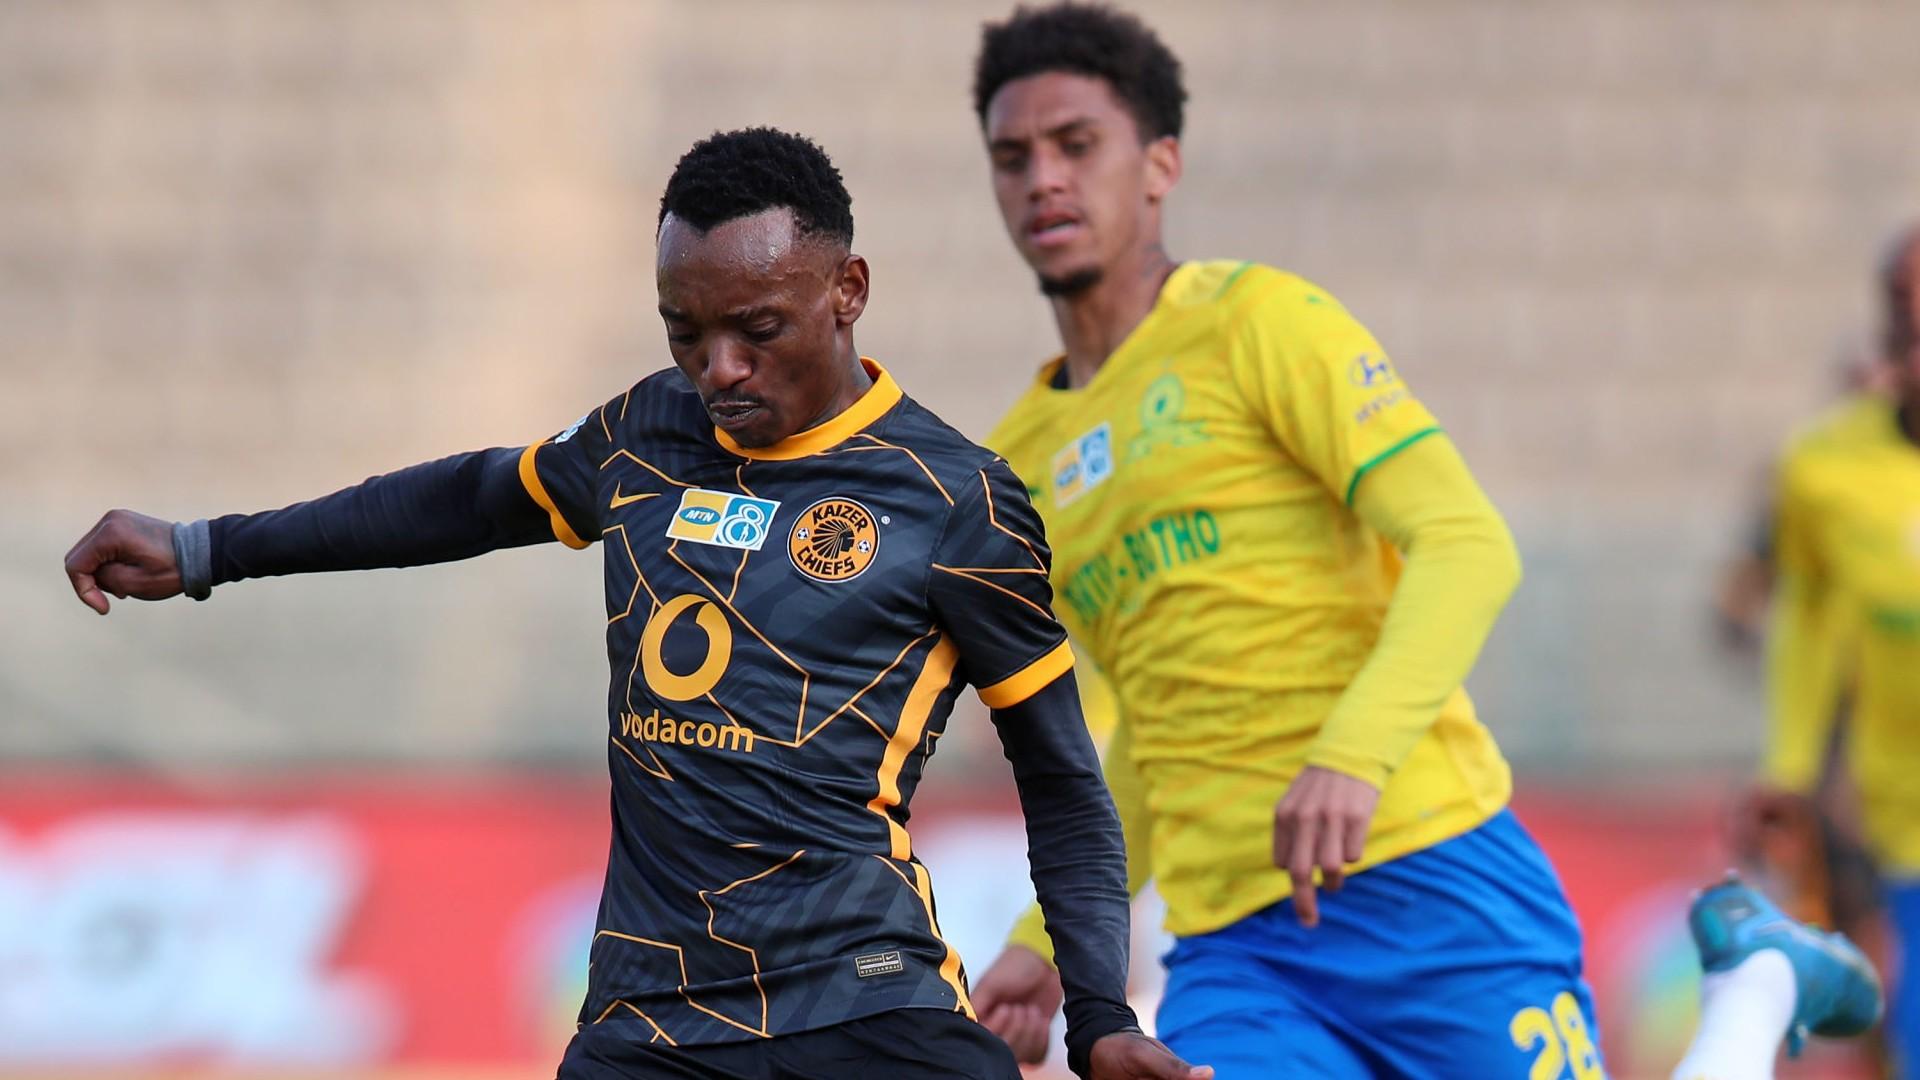 Mamelodi Sundowns and Kaizer Chiefs combined XI: De Reuck, Billiat, Shalulile